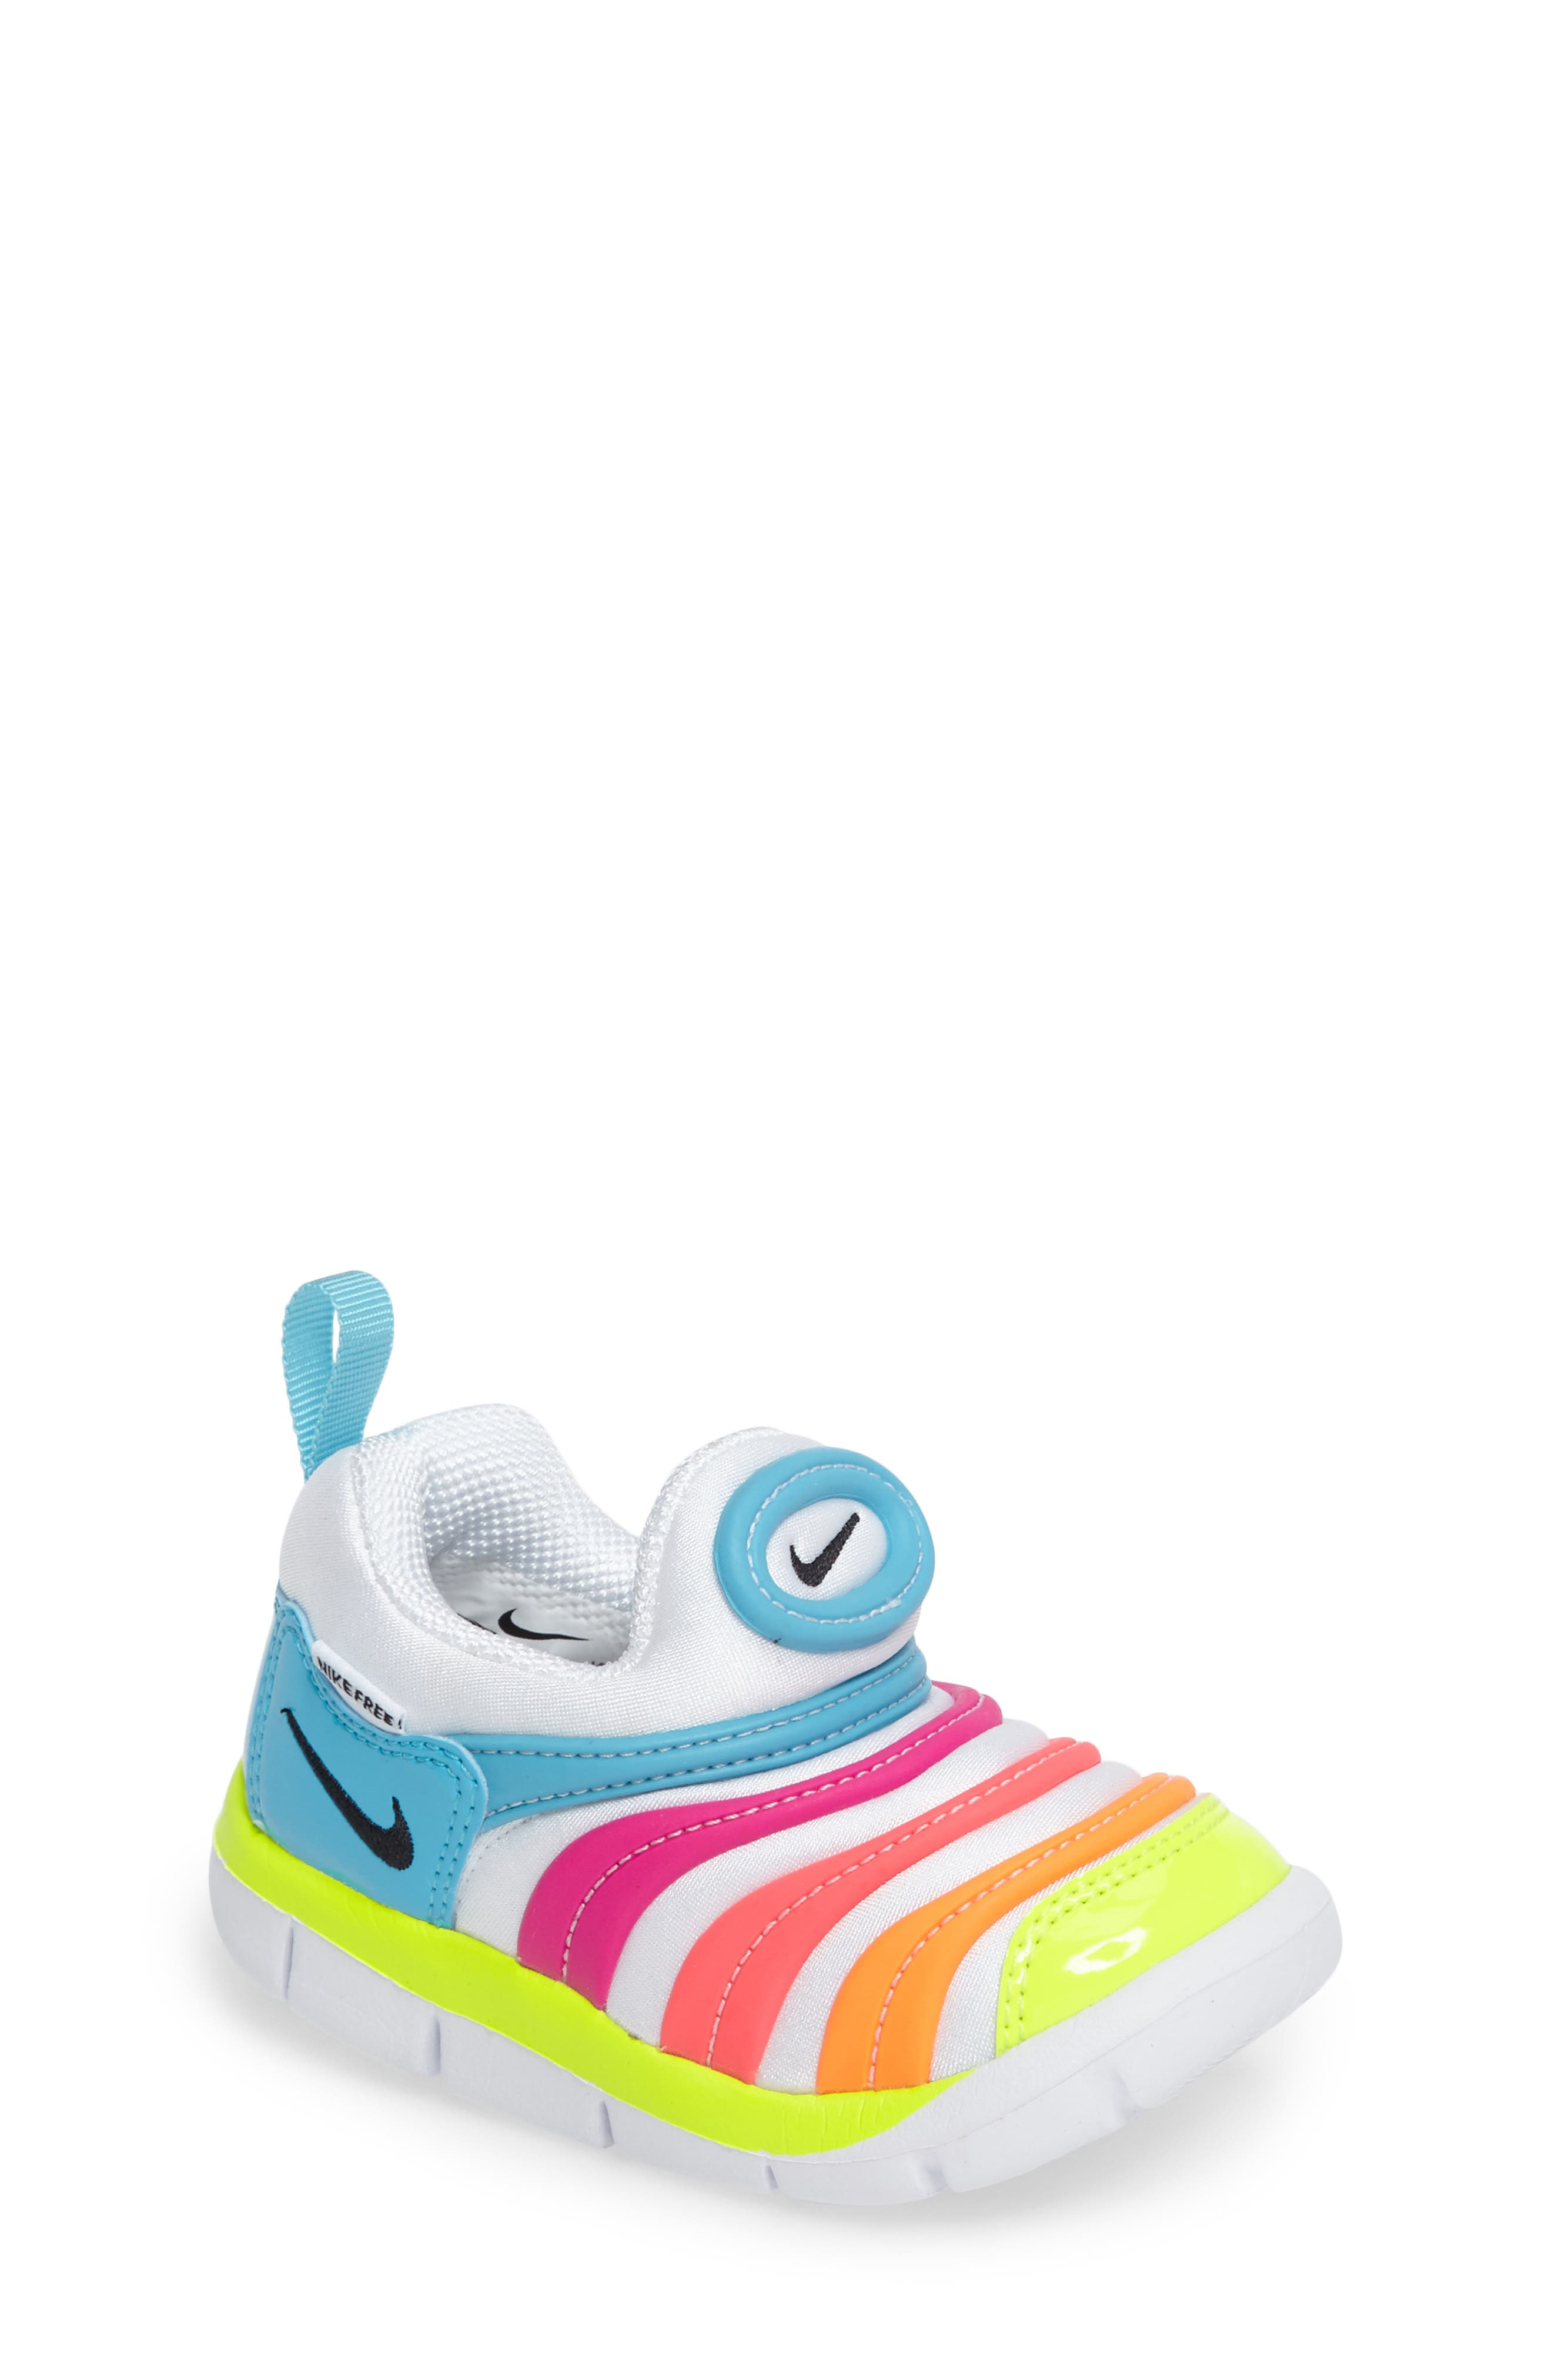 Alternate Image 1 Selected - Nike Dynamo Free Sneaker (Baby, Walker, & Toddler)